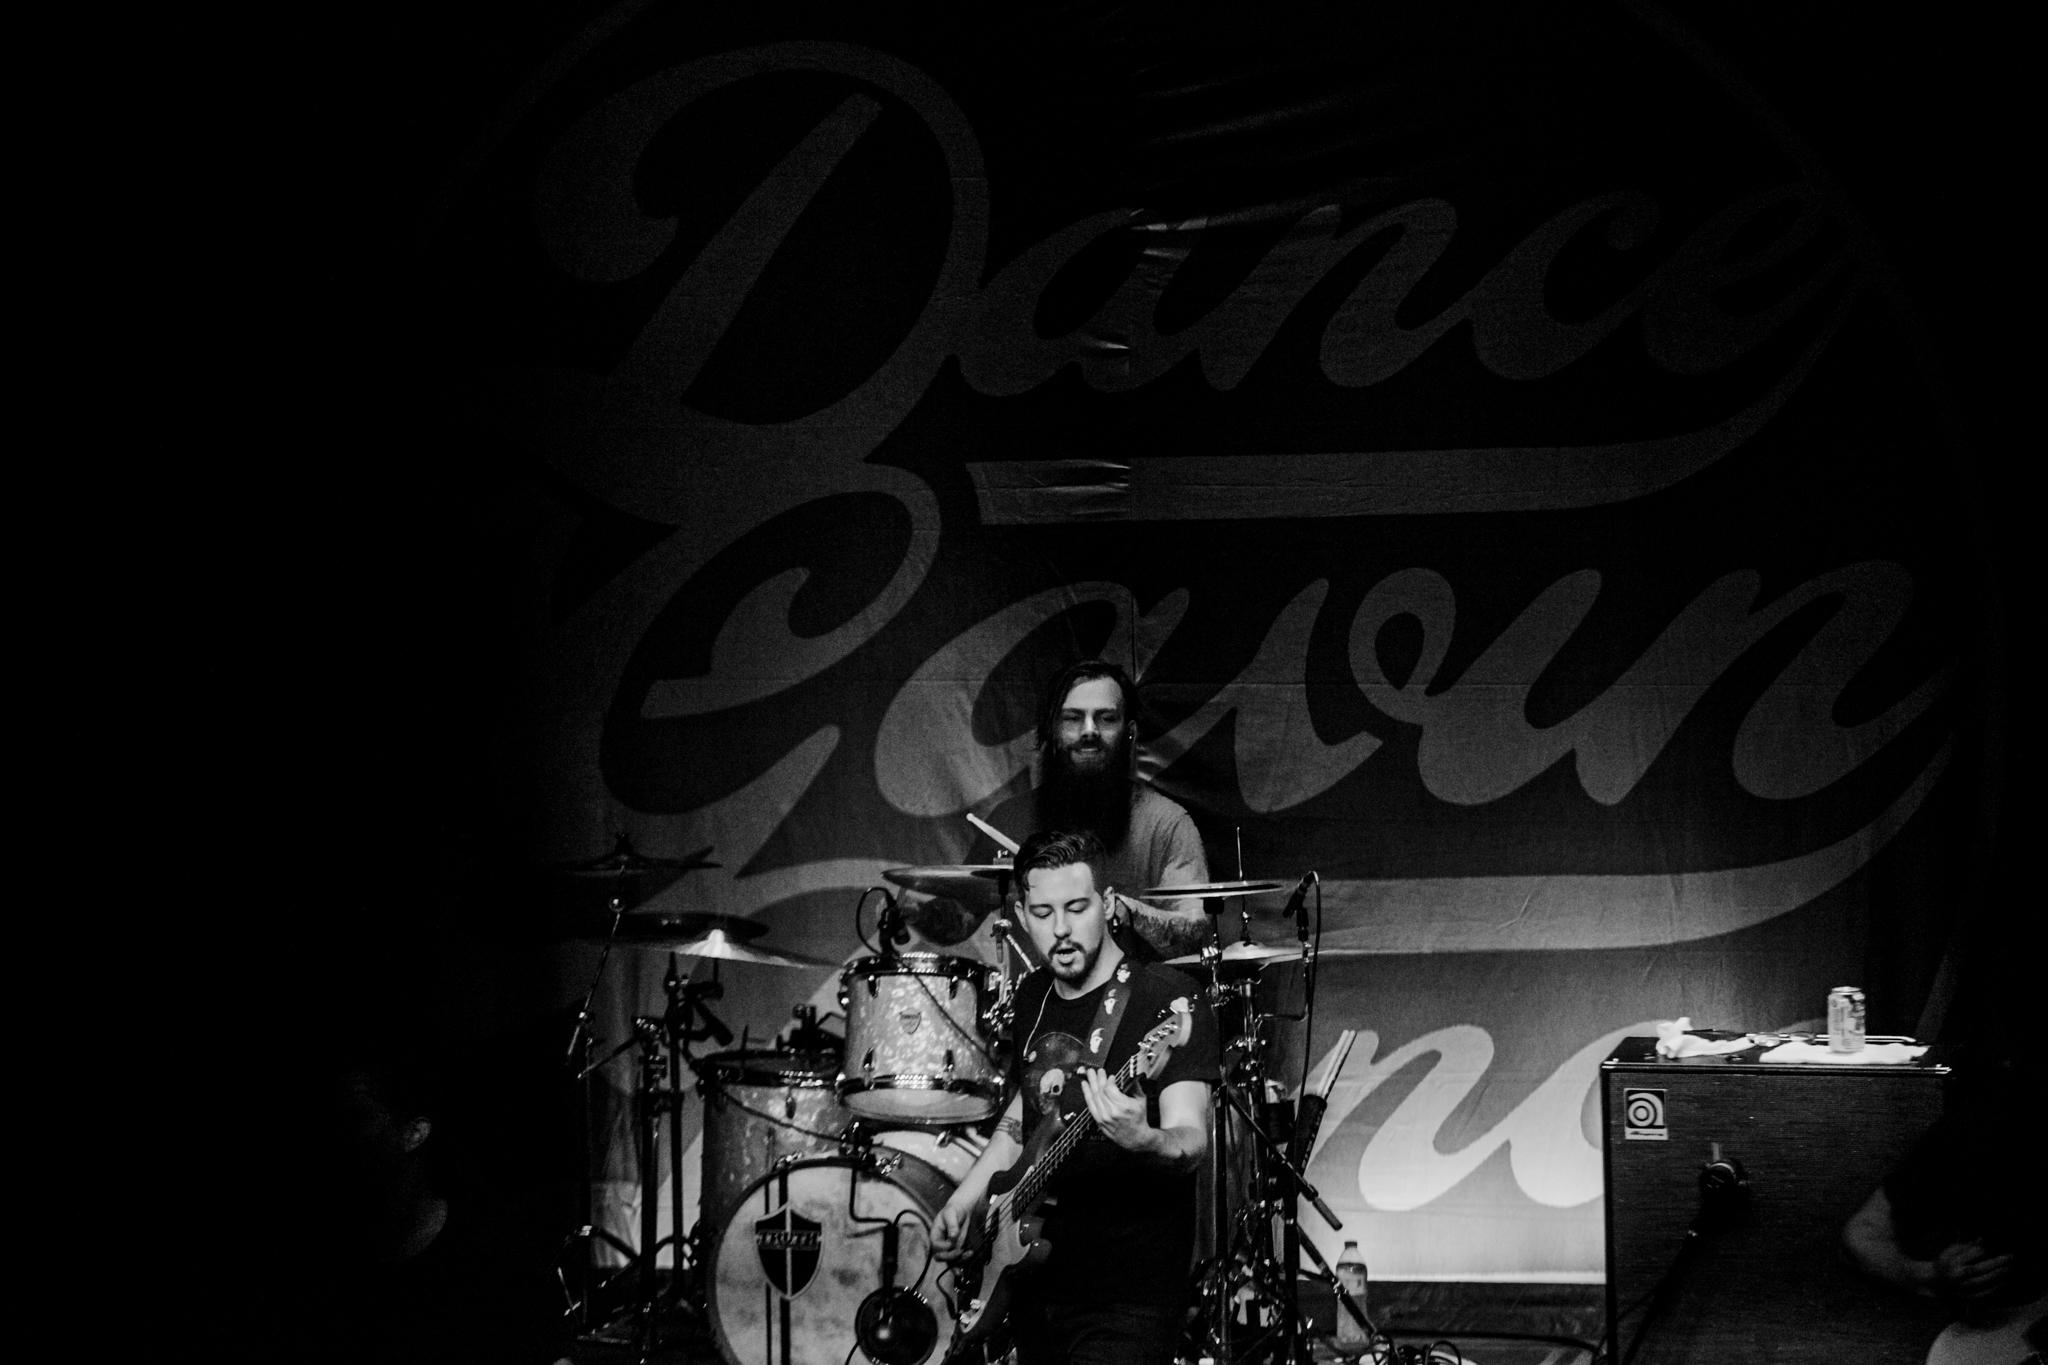 Lafferty Photo - Dance Gavin Dance 03.08.17-8858.jpg